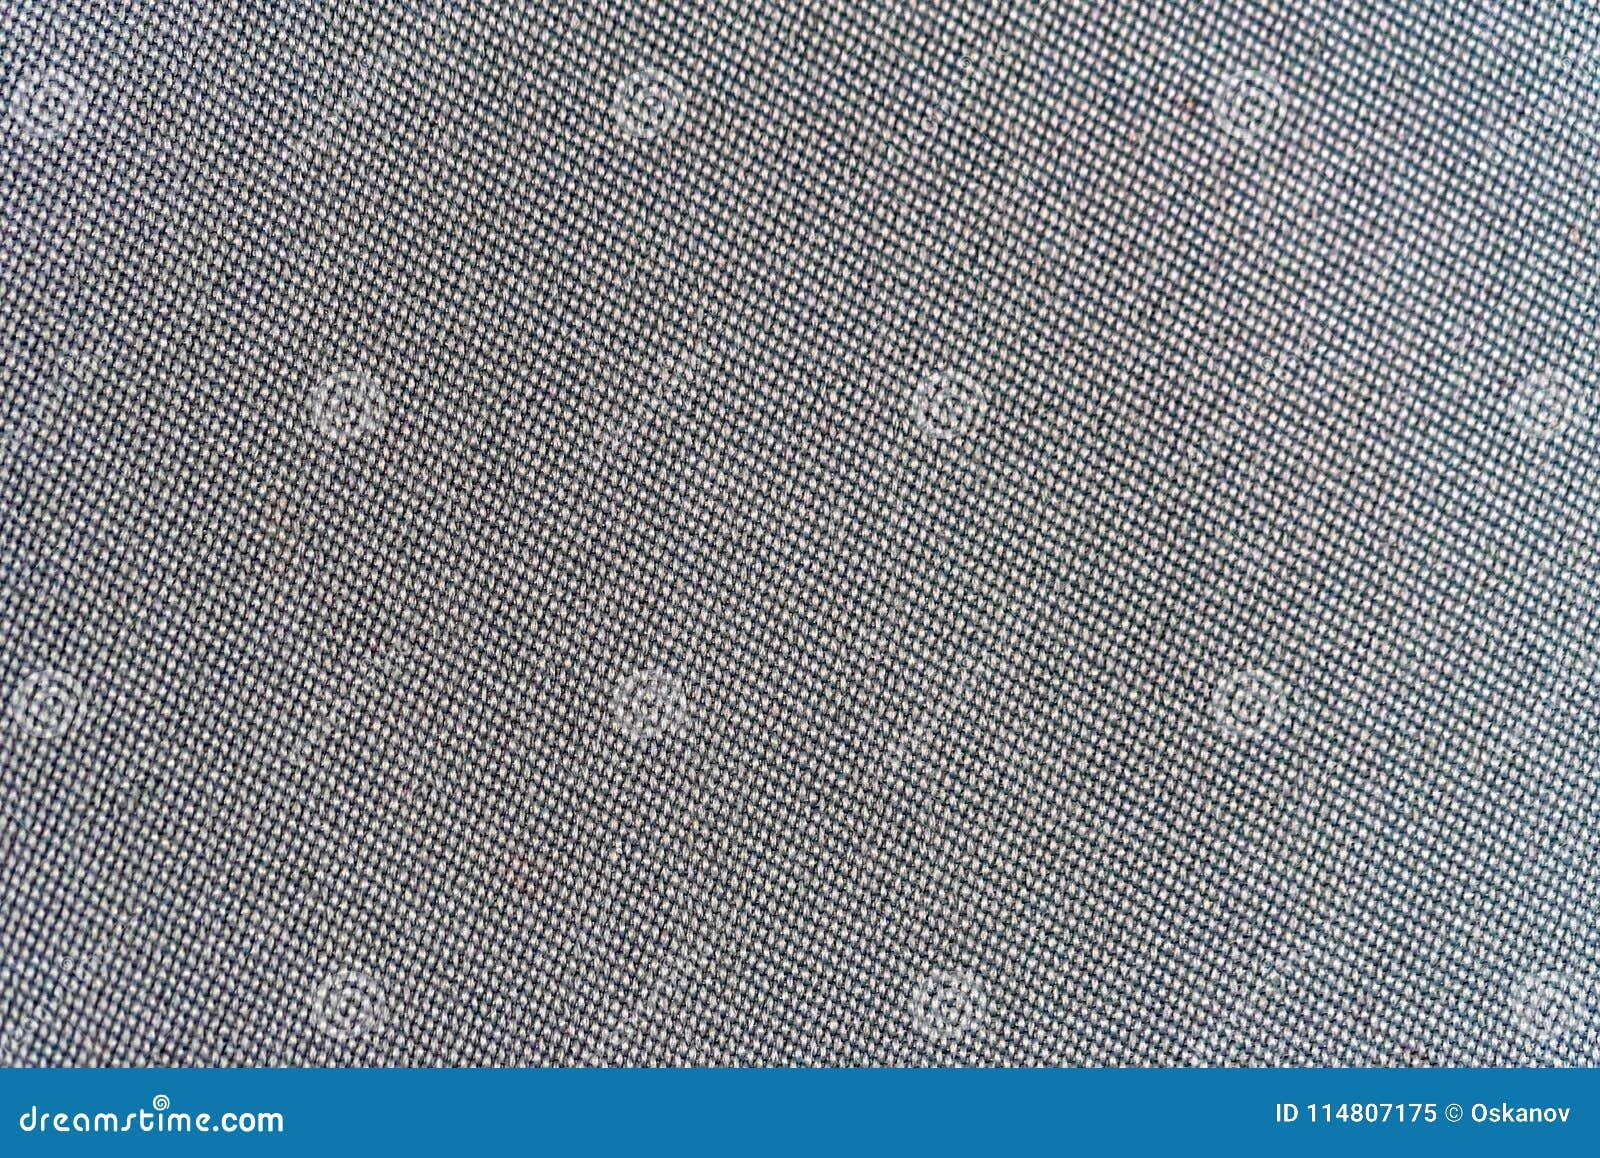 Dark car textile macro texture